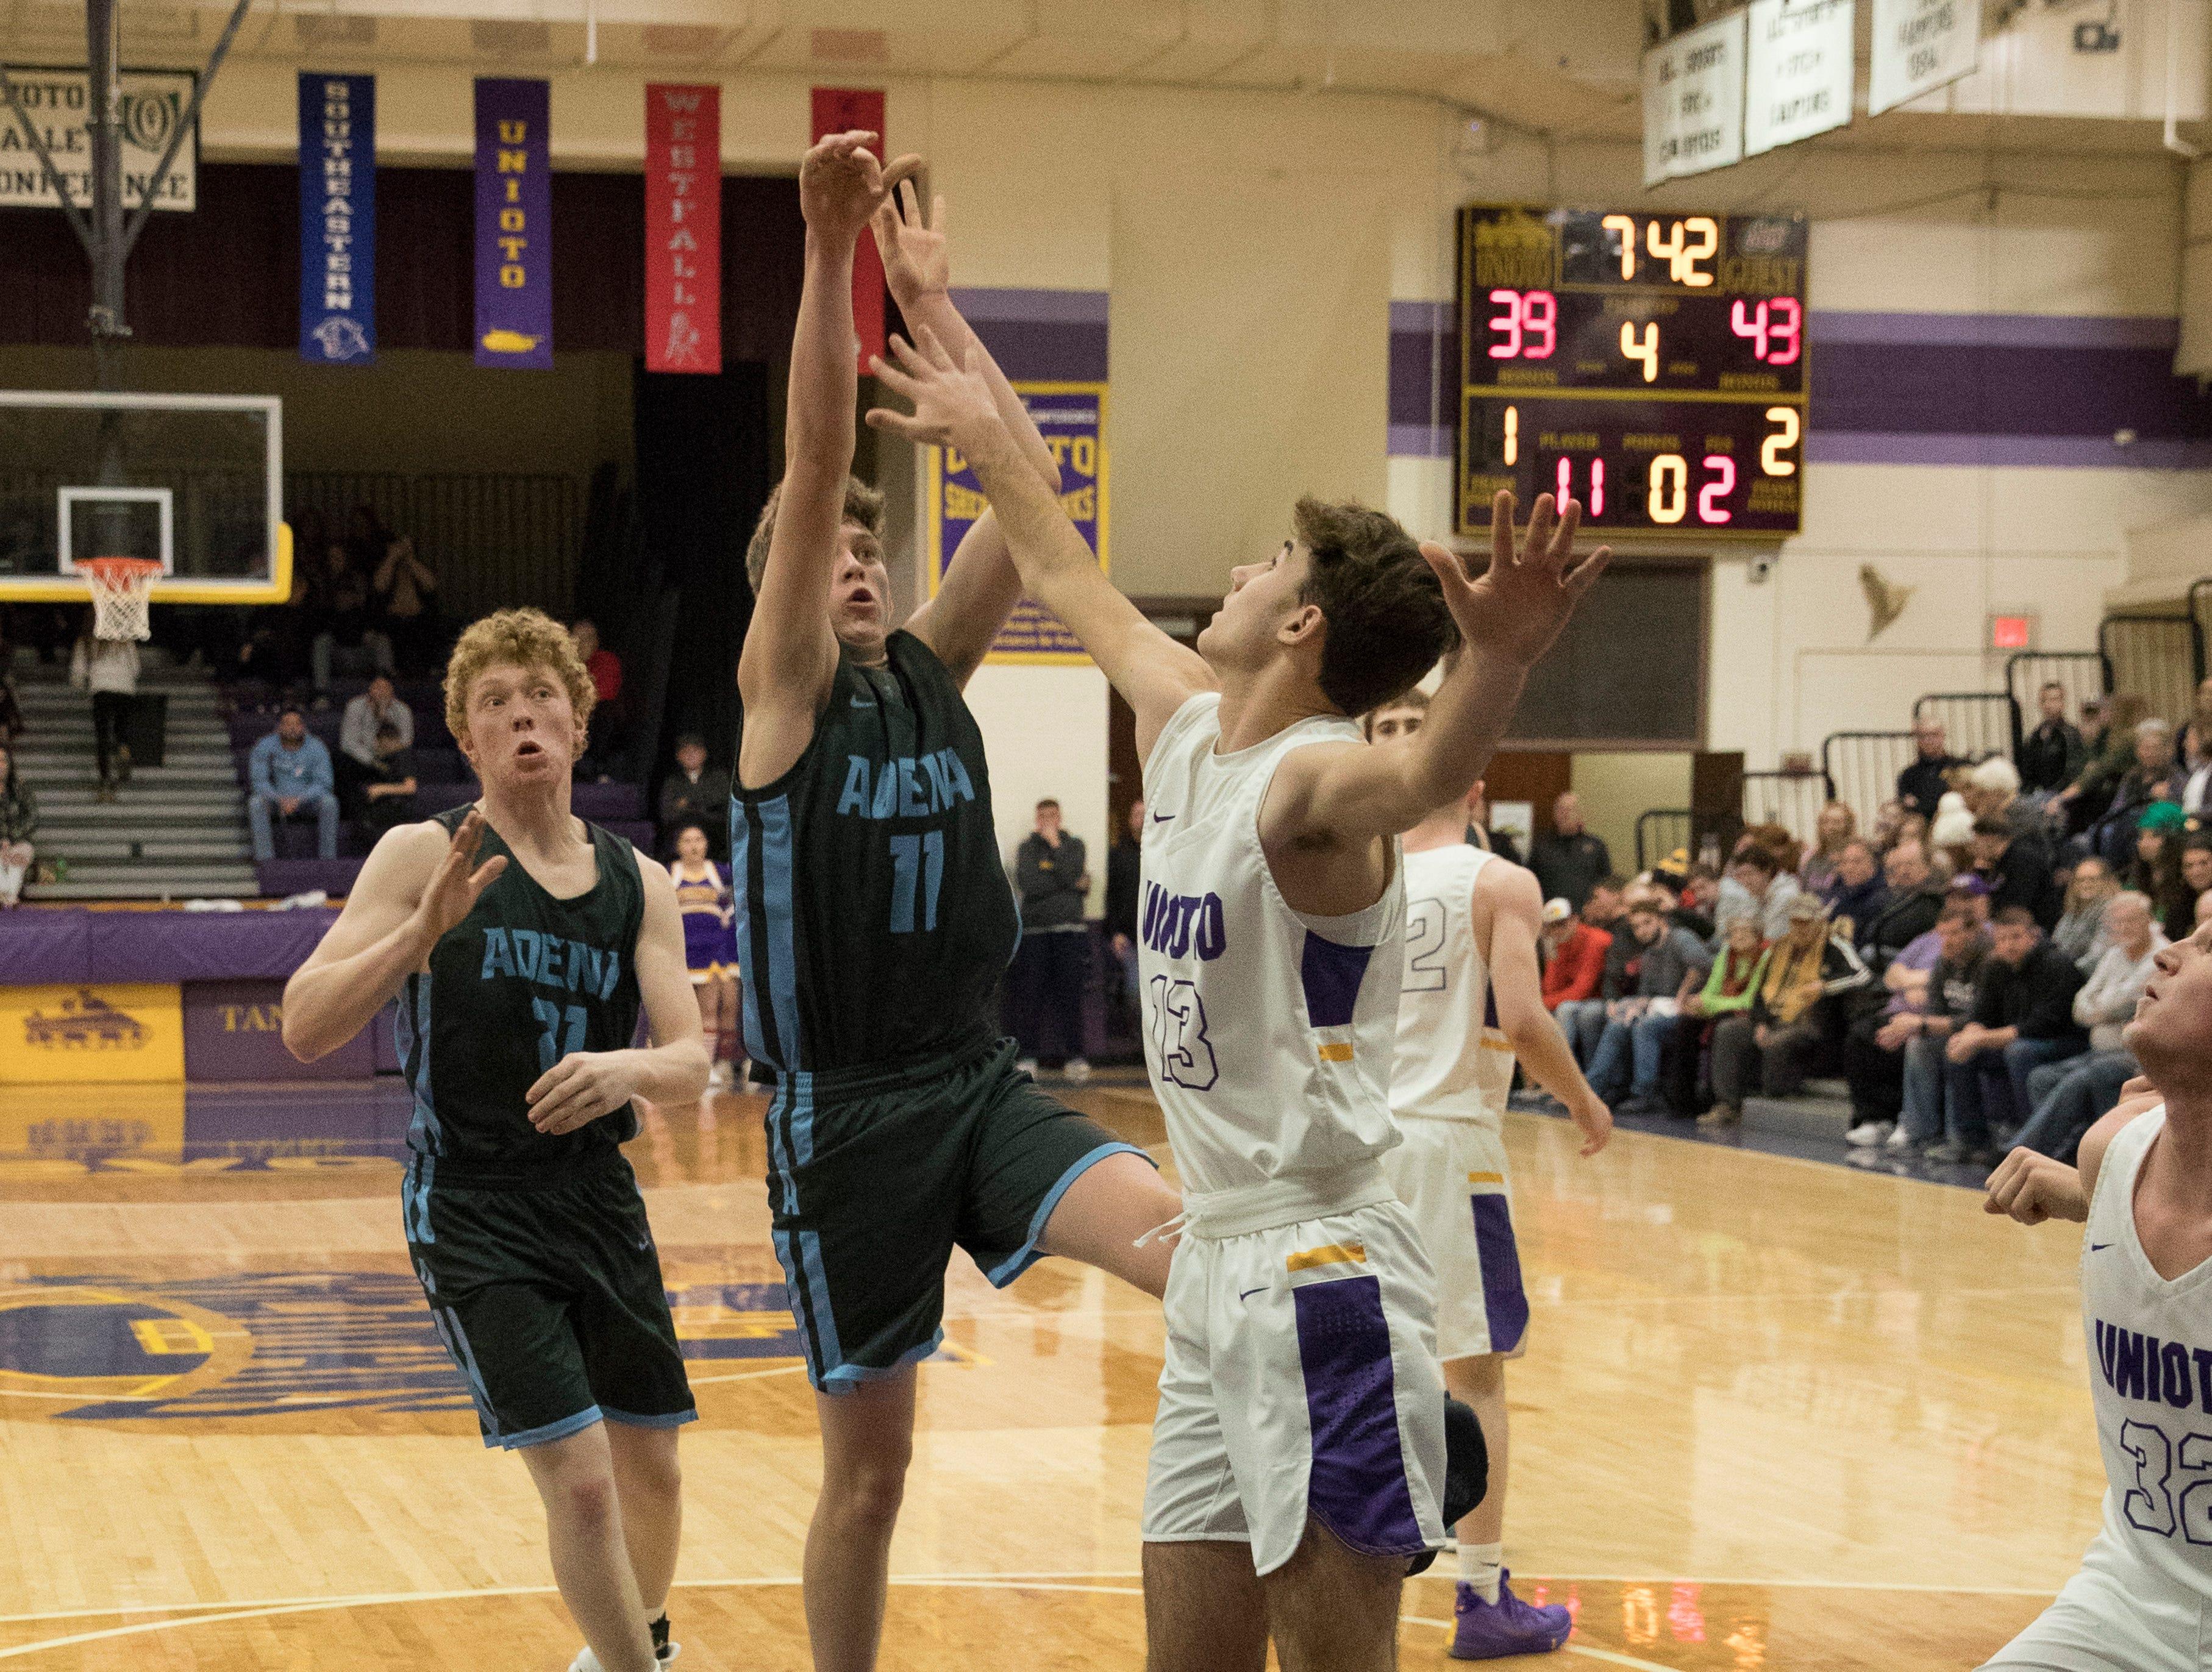 Adena defeated Unioto 55-53 Saturday night at Unioto High School in Chillicothe, Ohio, giving Adena its sixth SVC win.